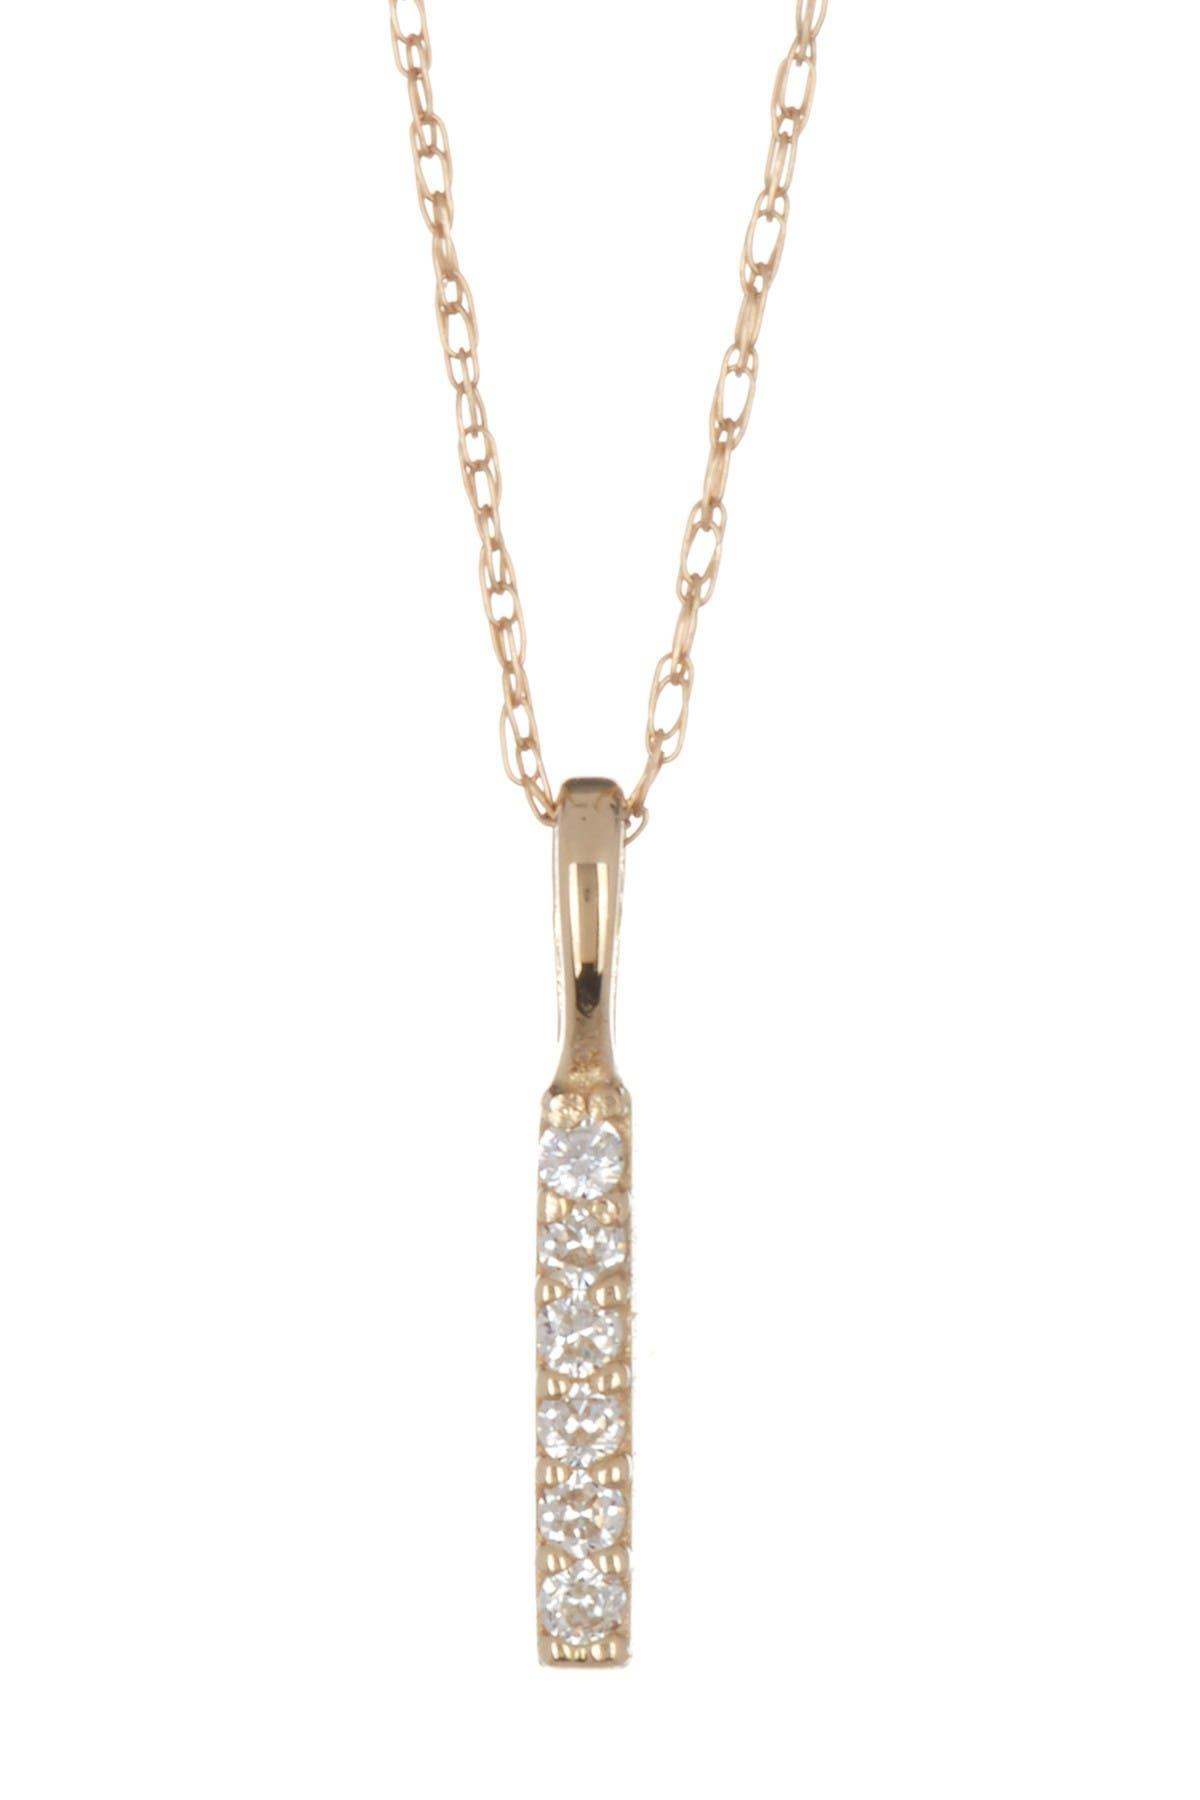 Image of Candela 10K Yellow Gold CZ Bar Necklace